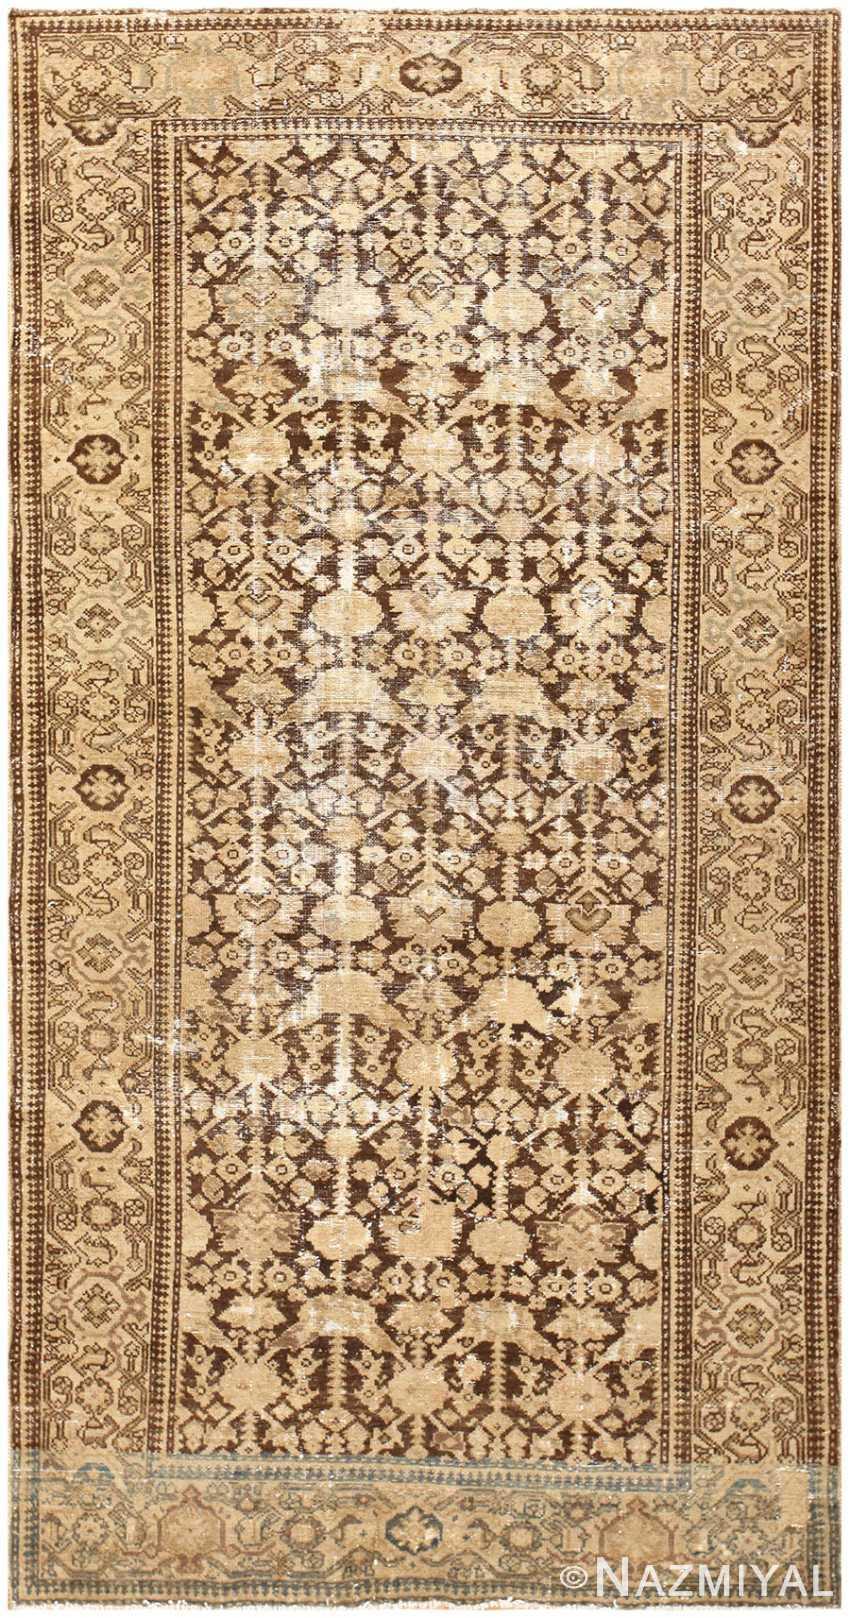 Antique Persian Malayer Carpet 50196 Nazmiyal